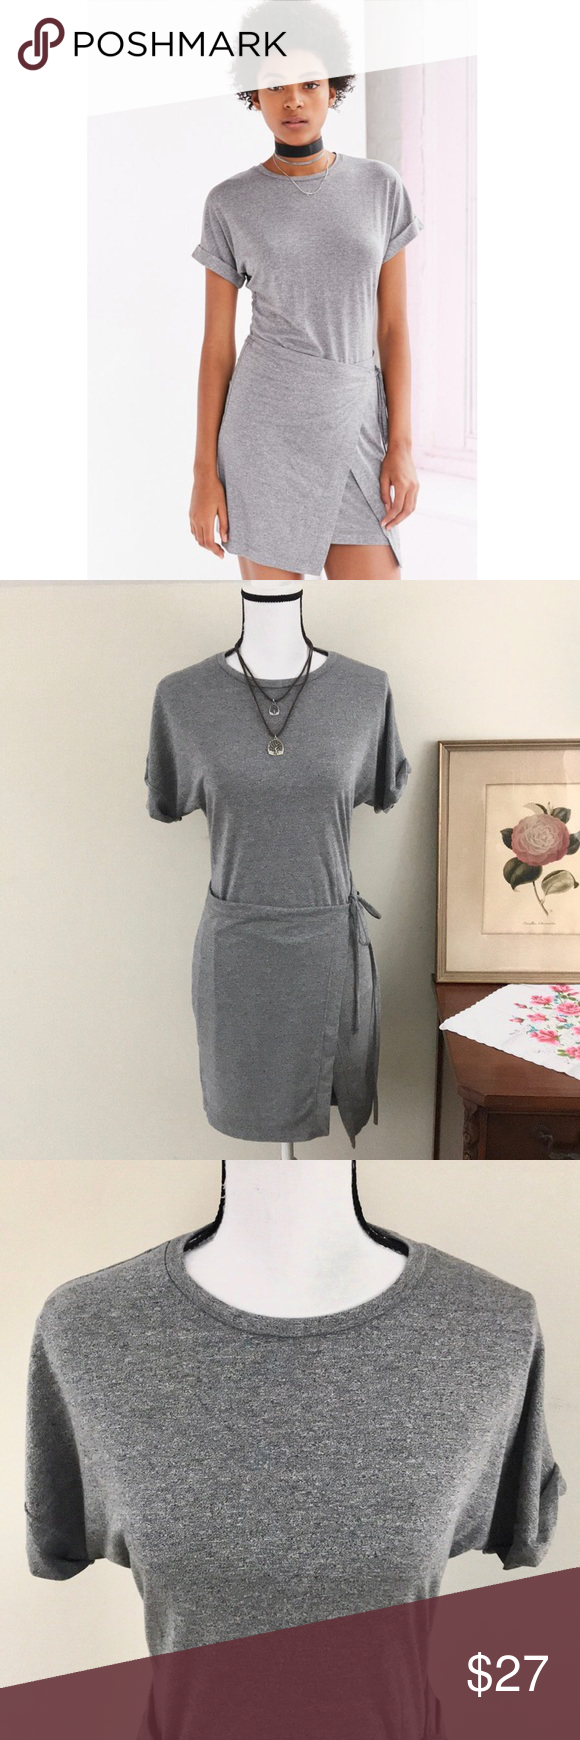 Uo Silence Noise Wrap T Shirt Dress Sz S T Shirt Dress Pullover Styling Clothes Design [ 1740 x 580 Pixel ]